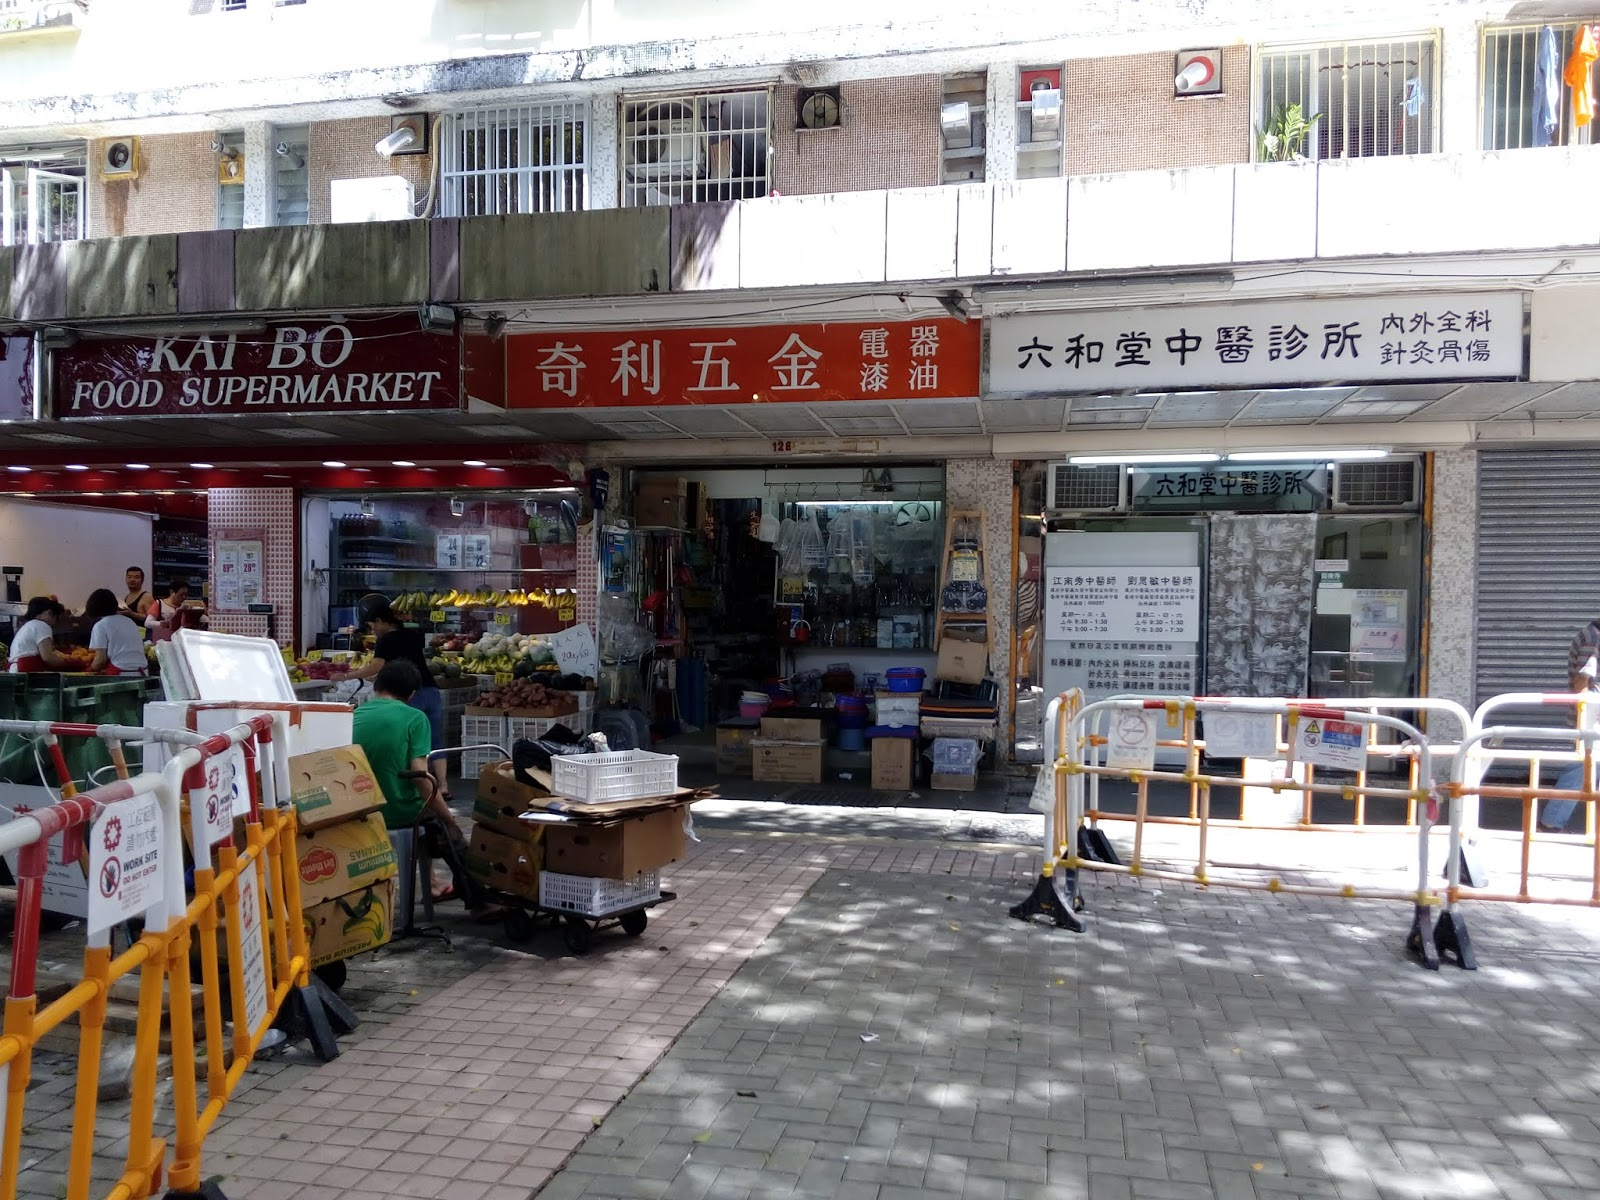 Grassroots O2: [領展商場] 樂華商場 @2018-06-30